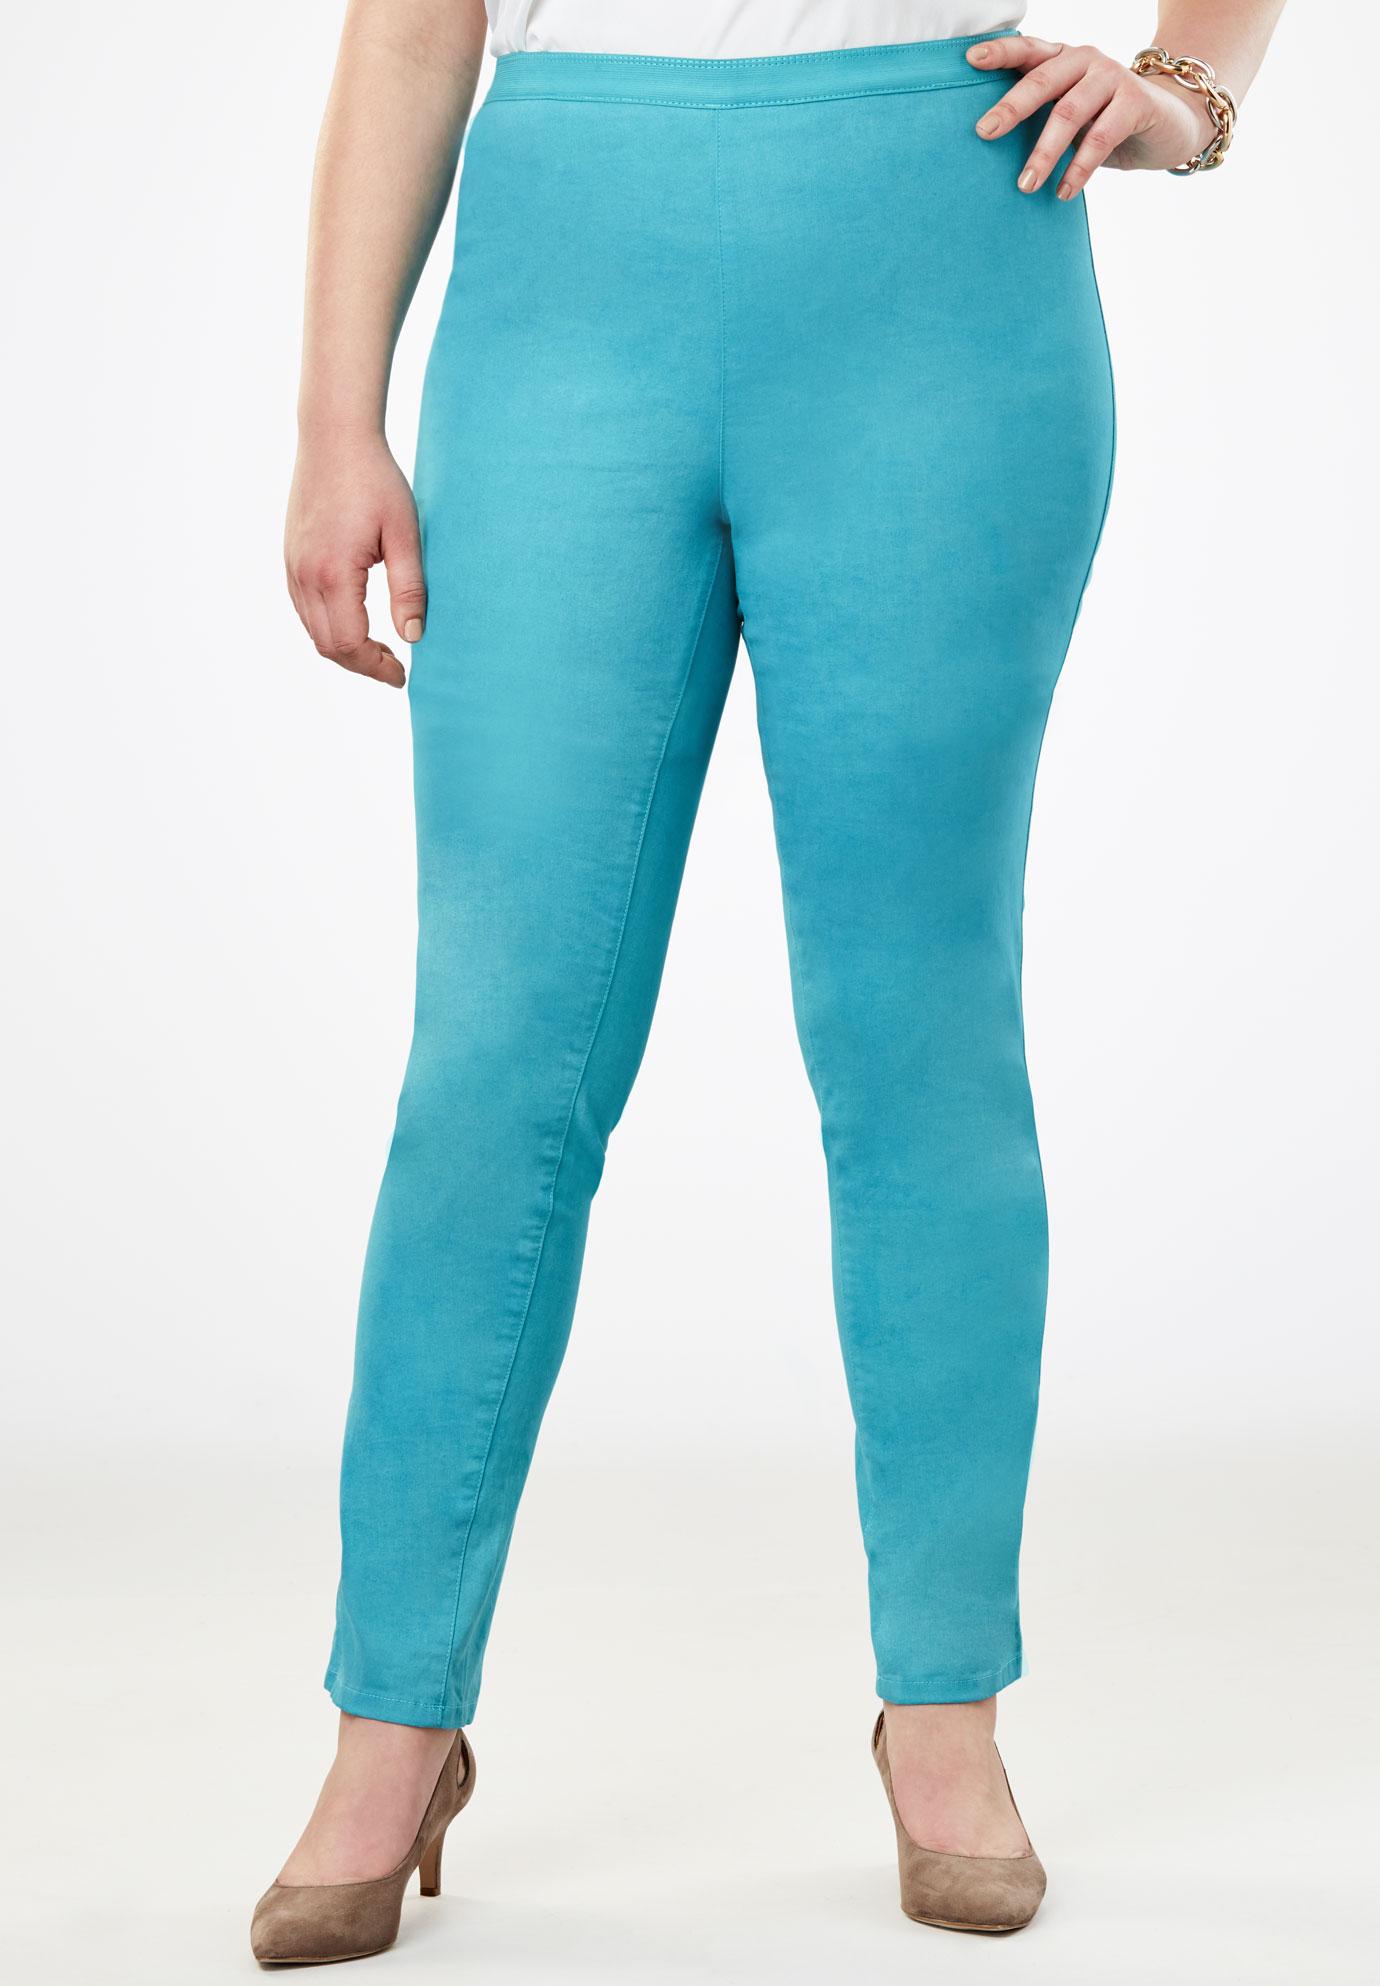 a5ff5f649c Straight Leg Stretch Denim Jeggings| Plus Size Pants | Full Beauty